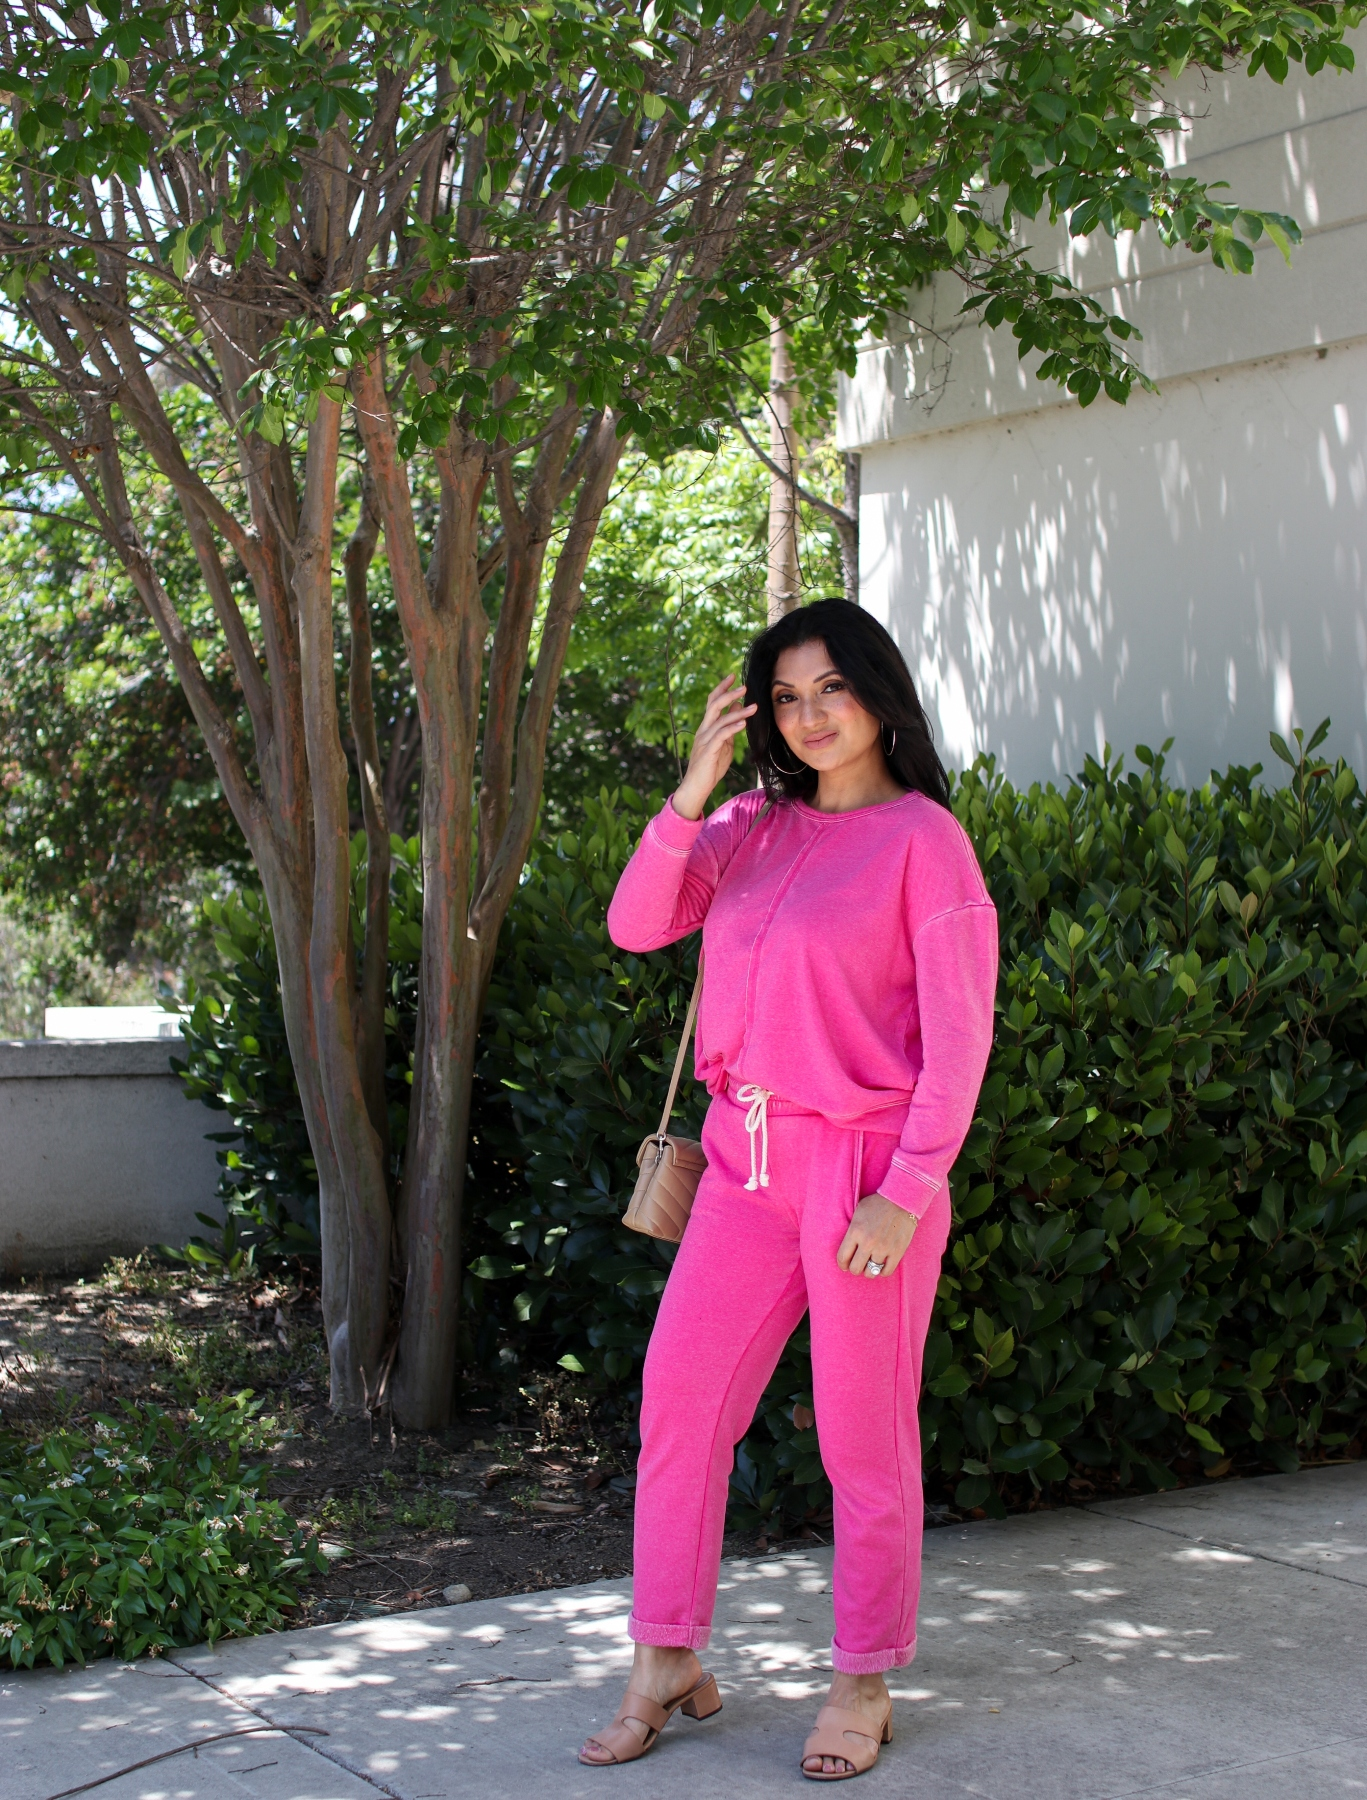 Adyson Parker Oil-Washed Sweatshirt and Sweatpants - Pink Flamingo